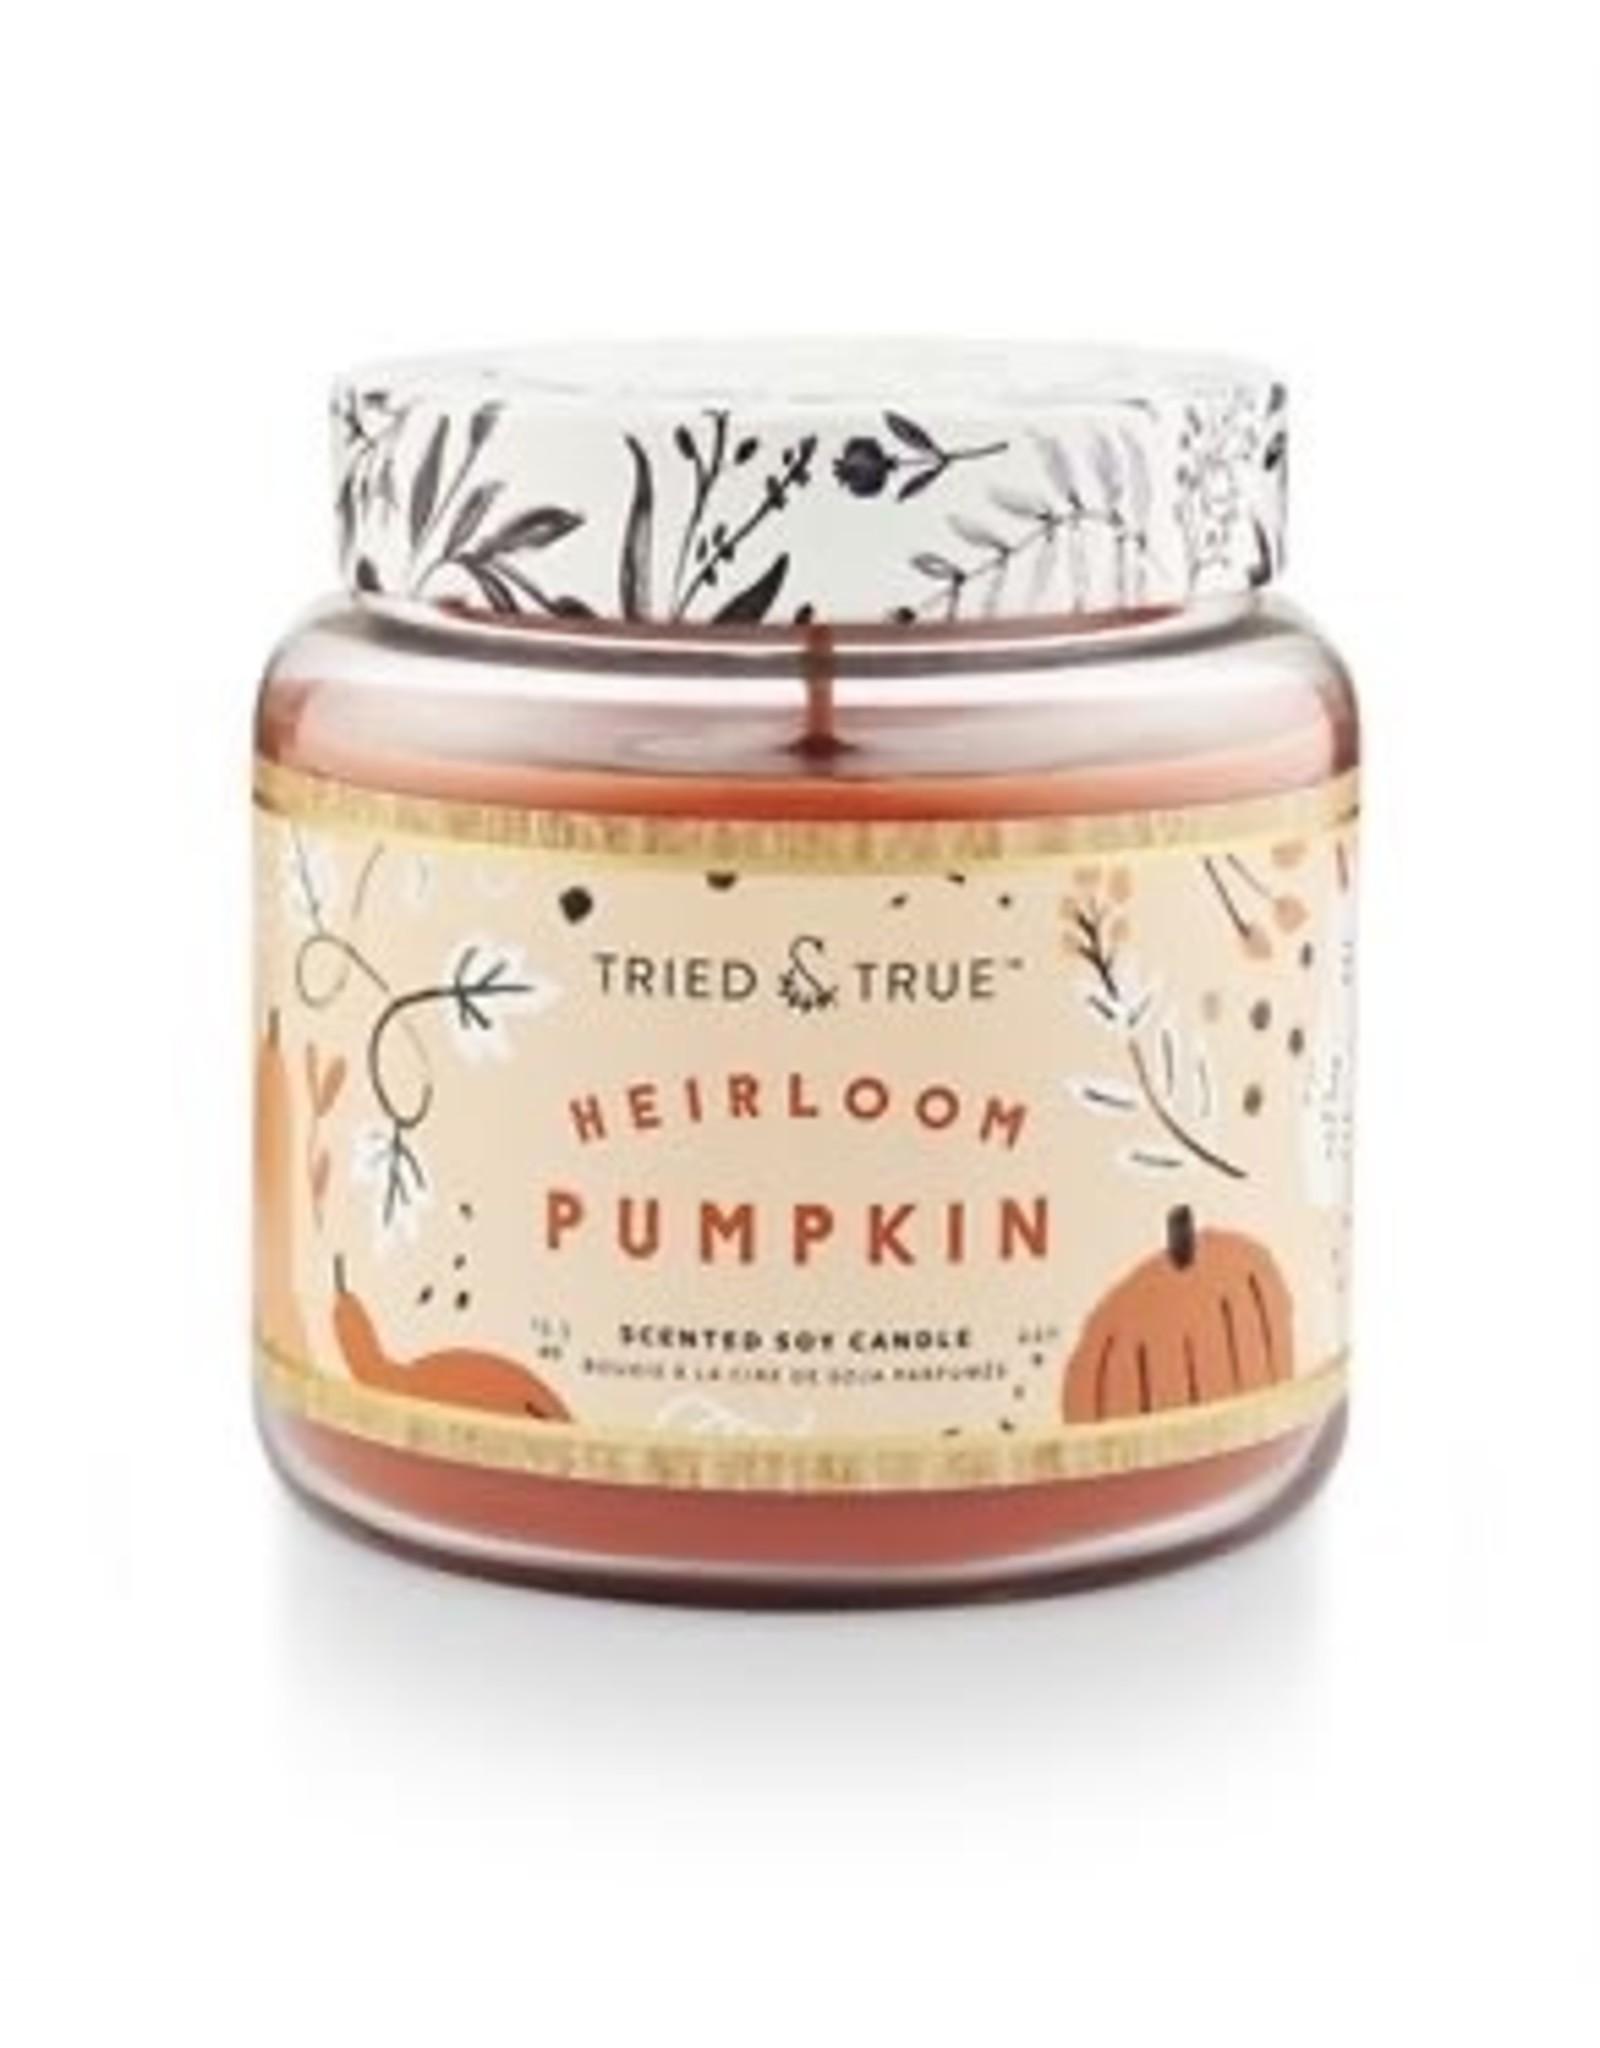 The Florist & The Merchant Heirloom Pumpkin Home Fragrance